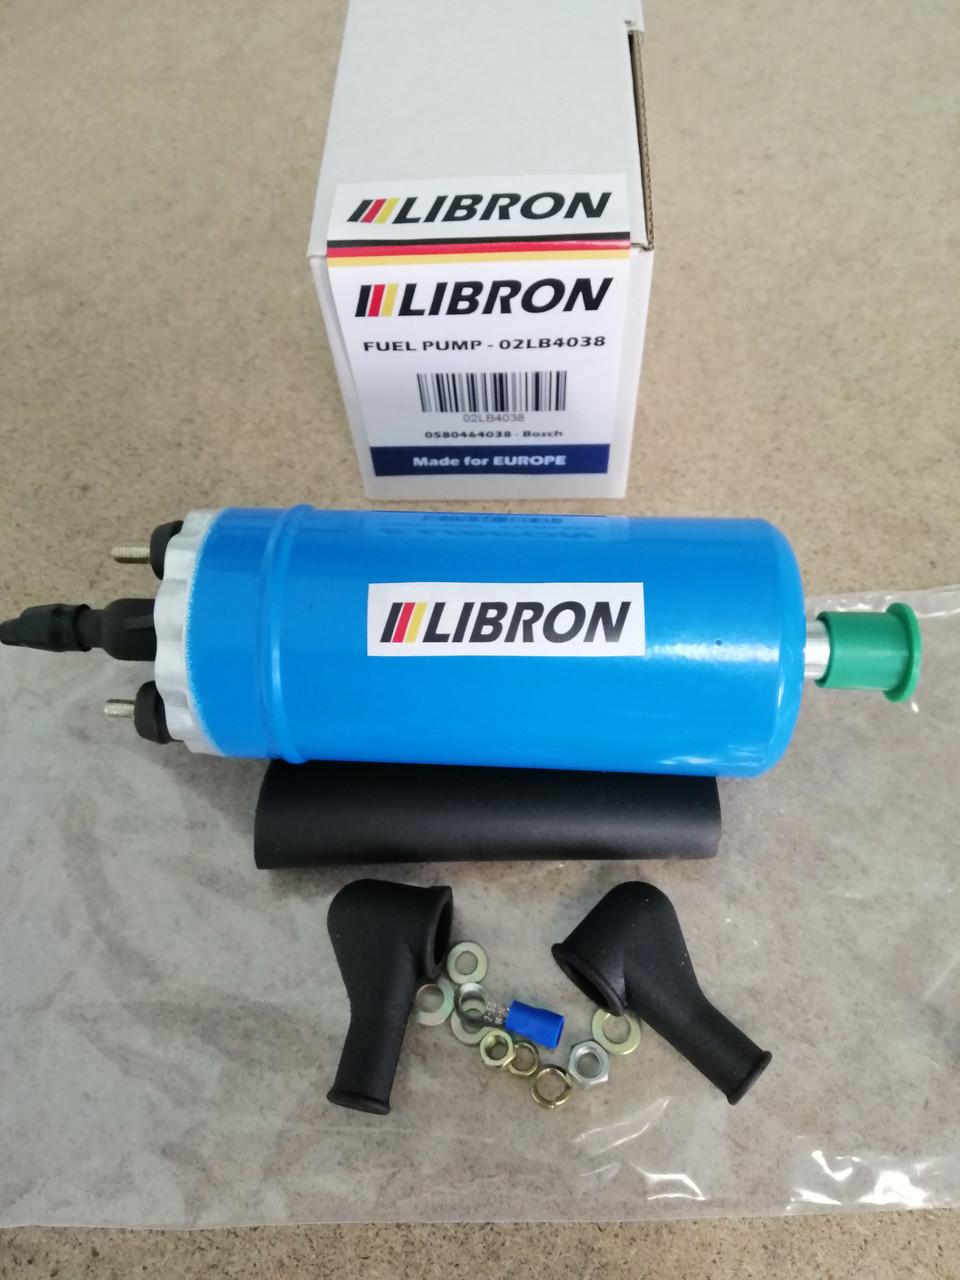 Бензонасос LIBRON 02LB4038 - BMW 3 кабрио (E30) M3 2.3 (1988-1991)